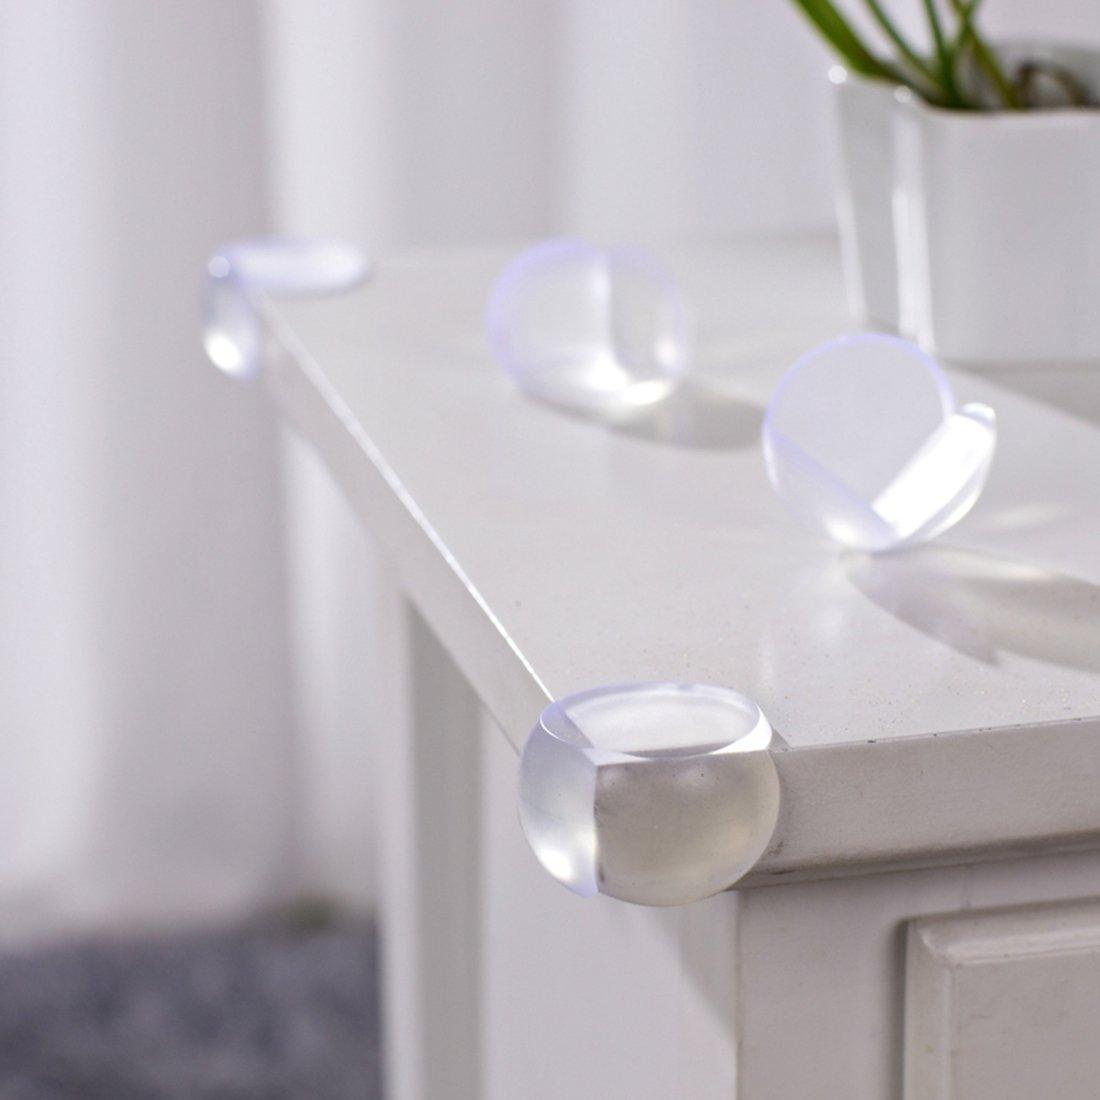 10pcs Baby Kid Table Desk Shelf Ball Corner Edge Cushions Protector Guard Safety